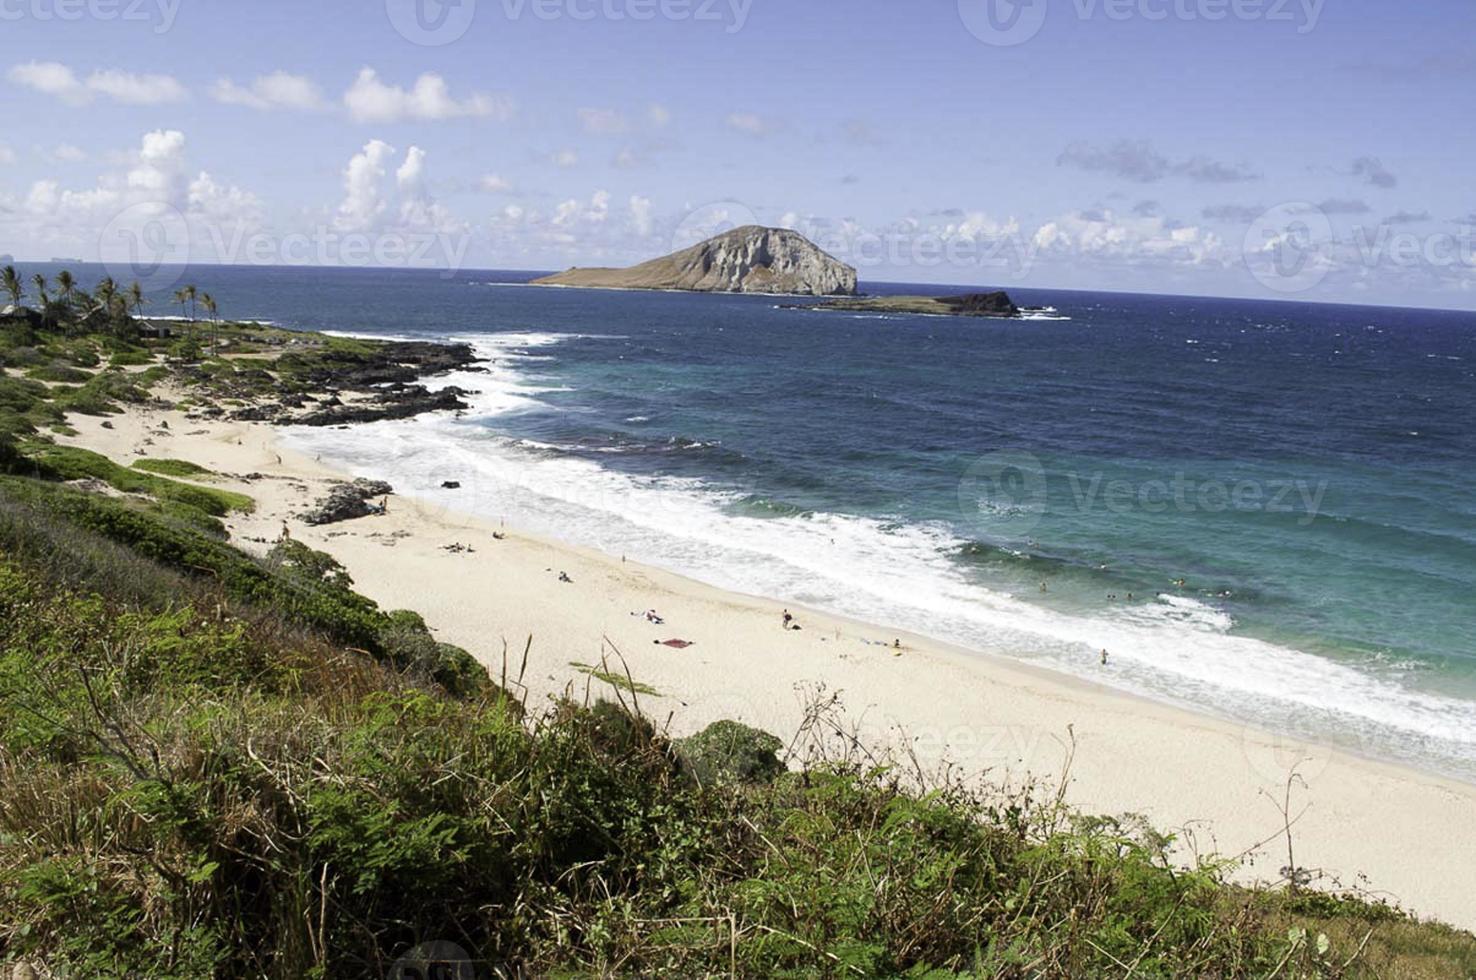 makapu'u beach vista op een zonnige dag. foto